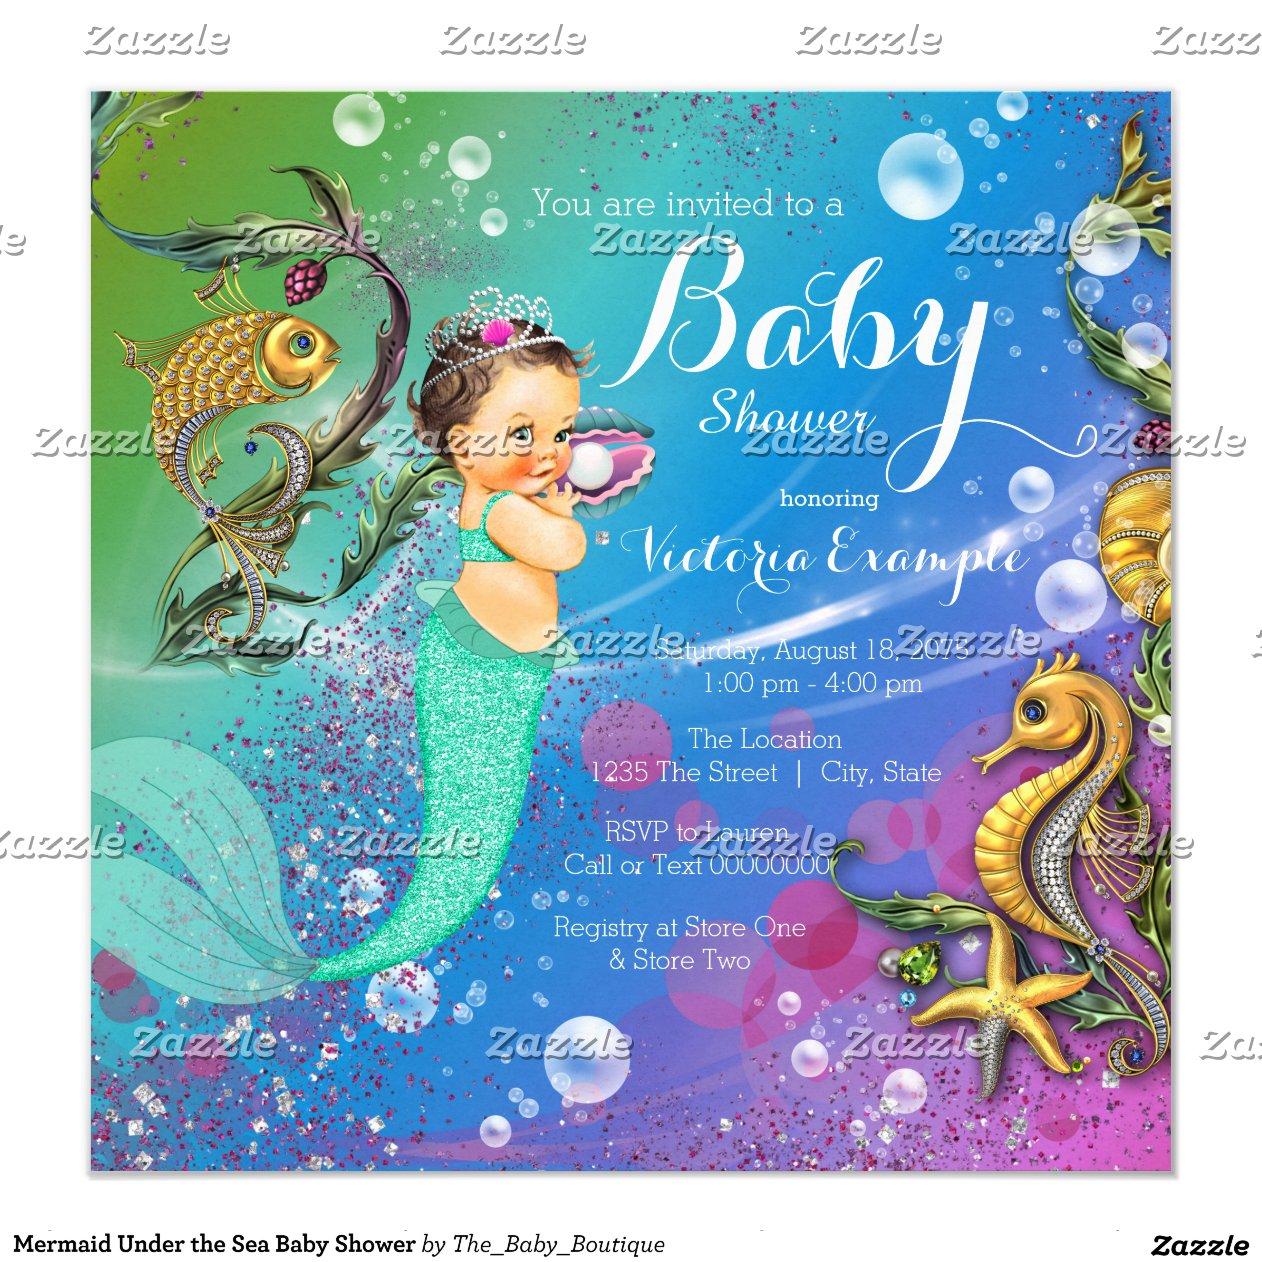 Mermaid Baby Shower Invitation was adorable invitation template